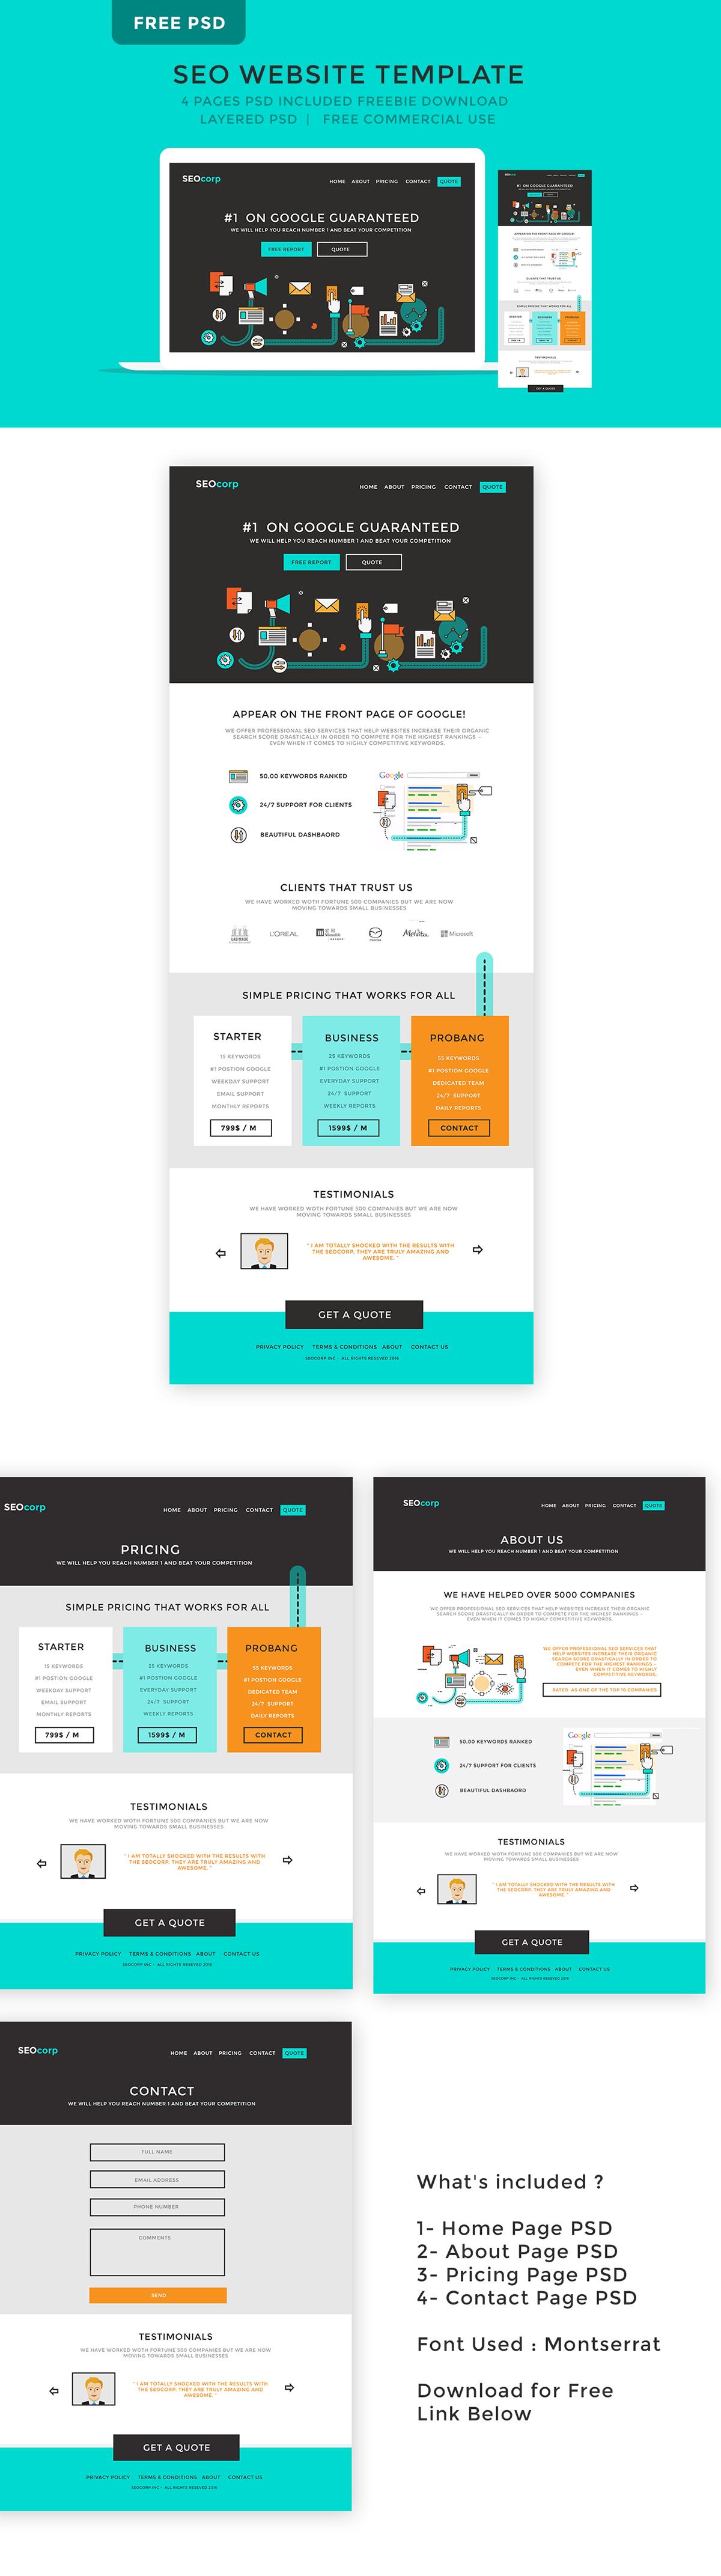 Free SEO Website Template PSD on Behance